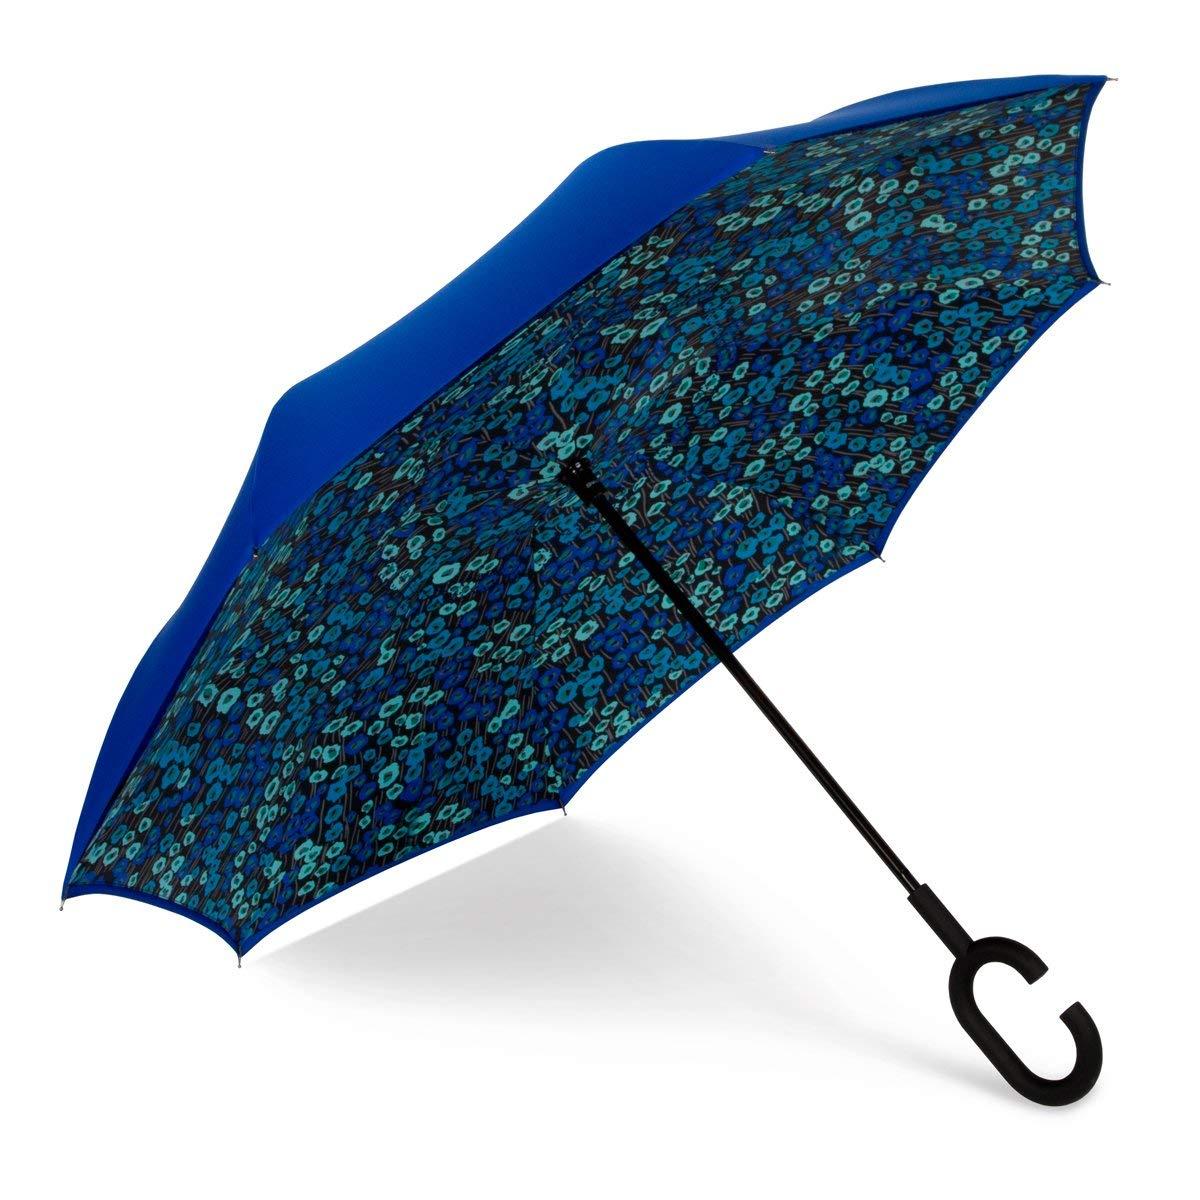 ShedRain UnbelievaBrella Fashion Floral Print Reverse Umbrella Monet